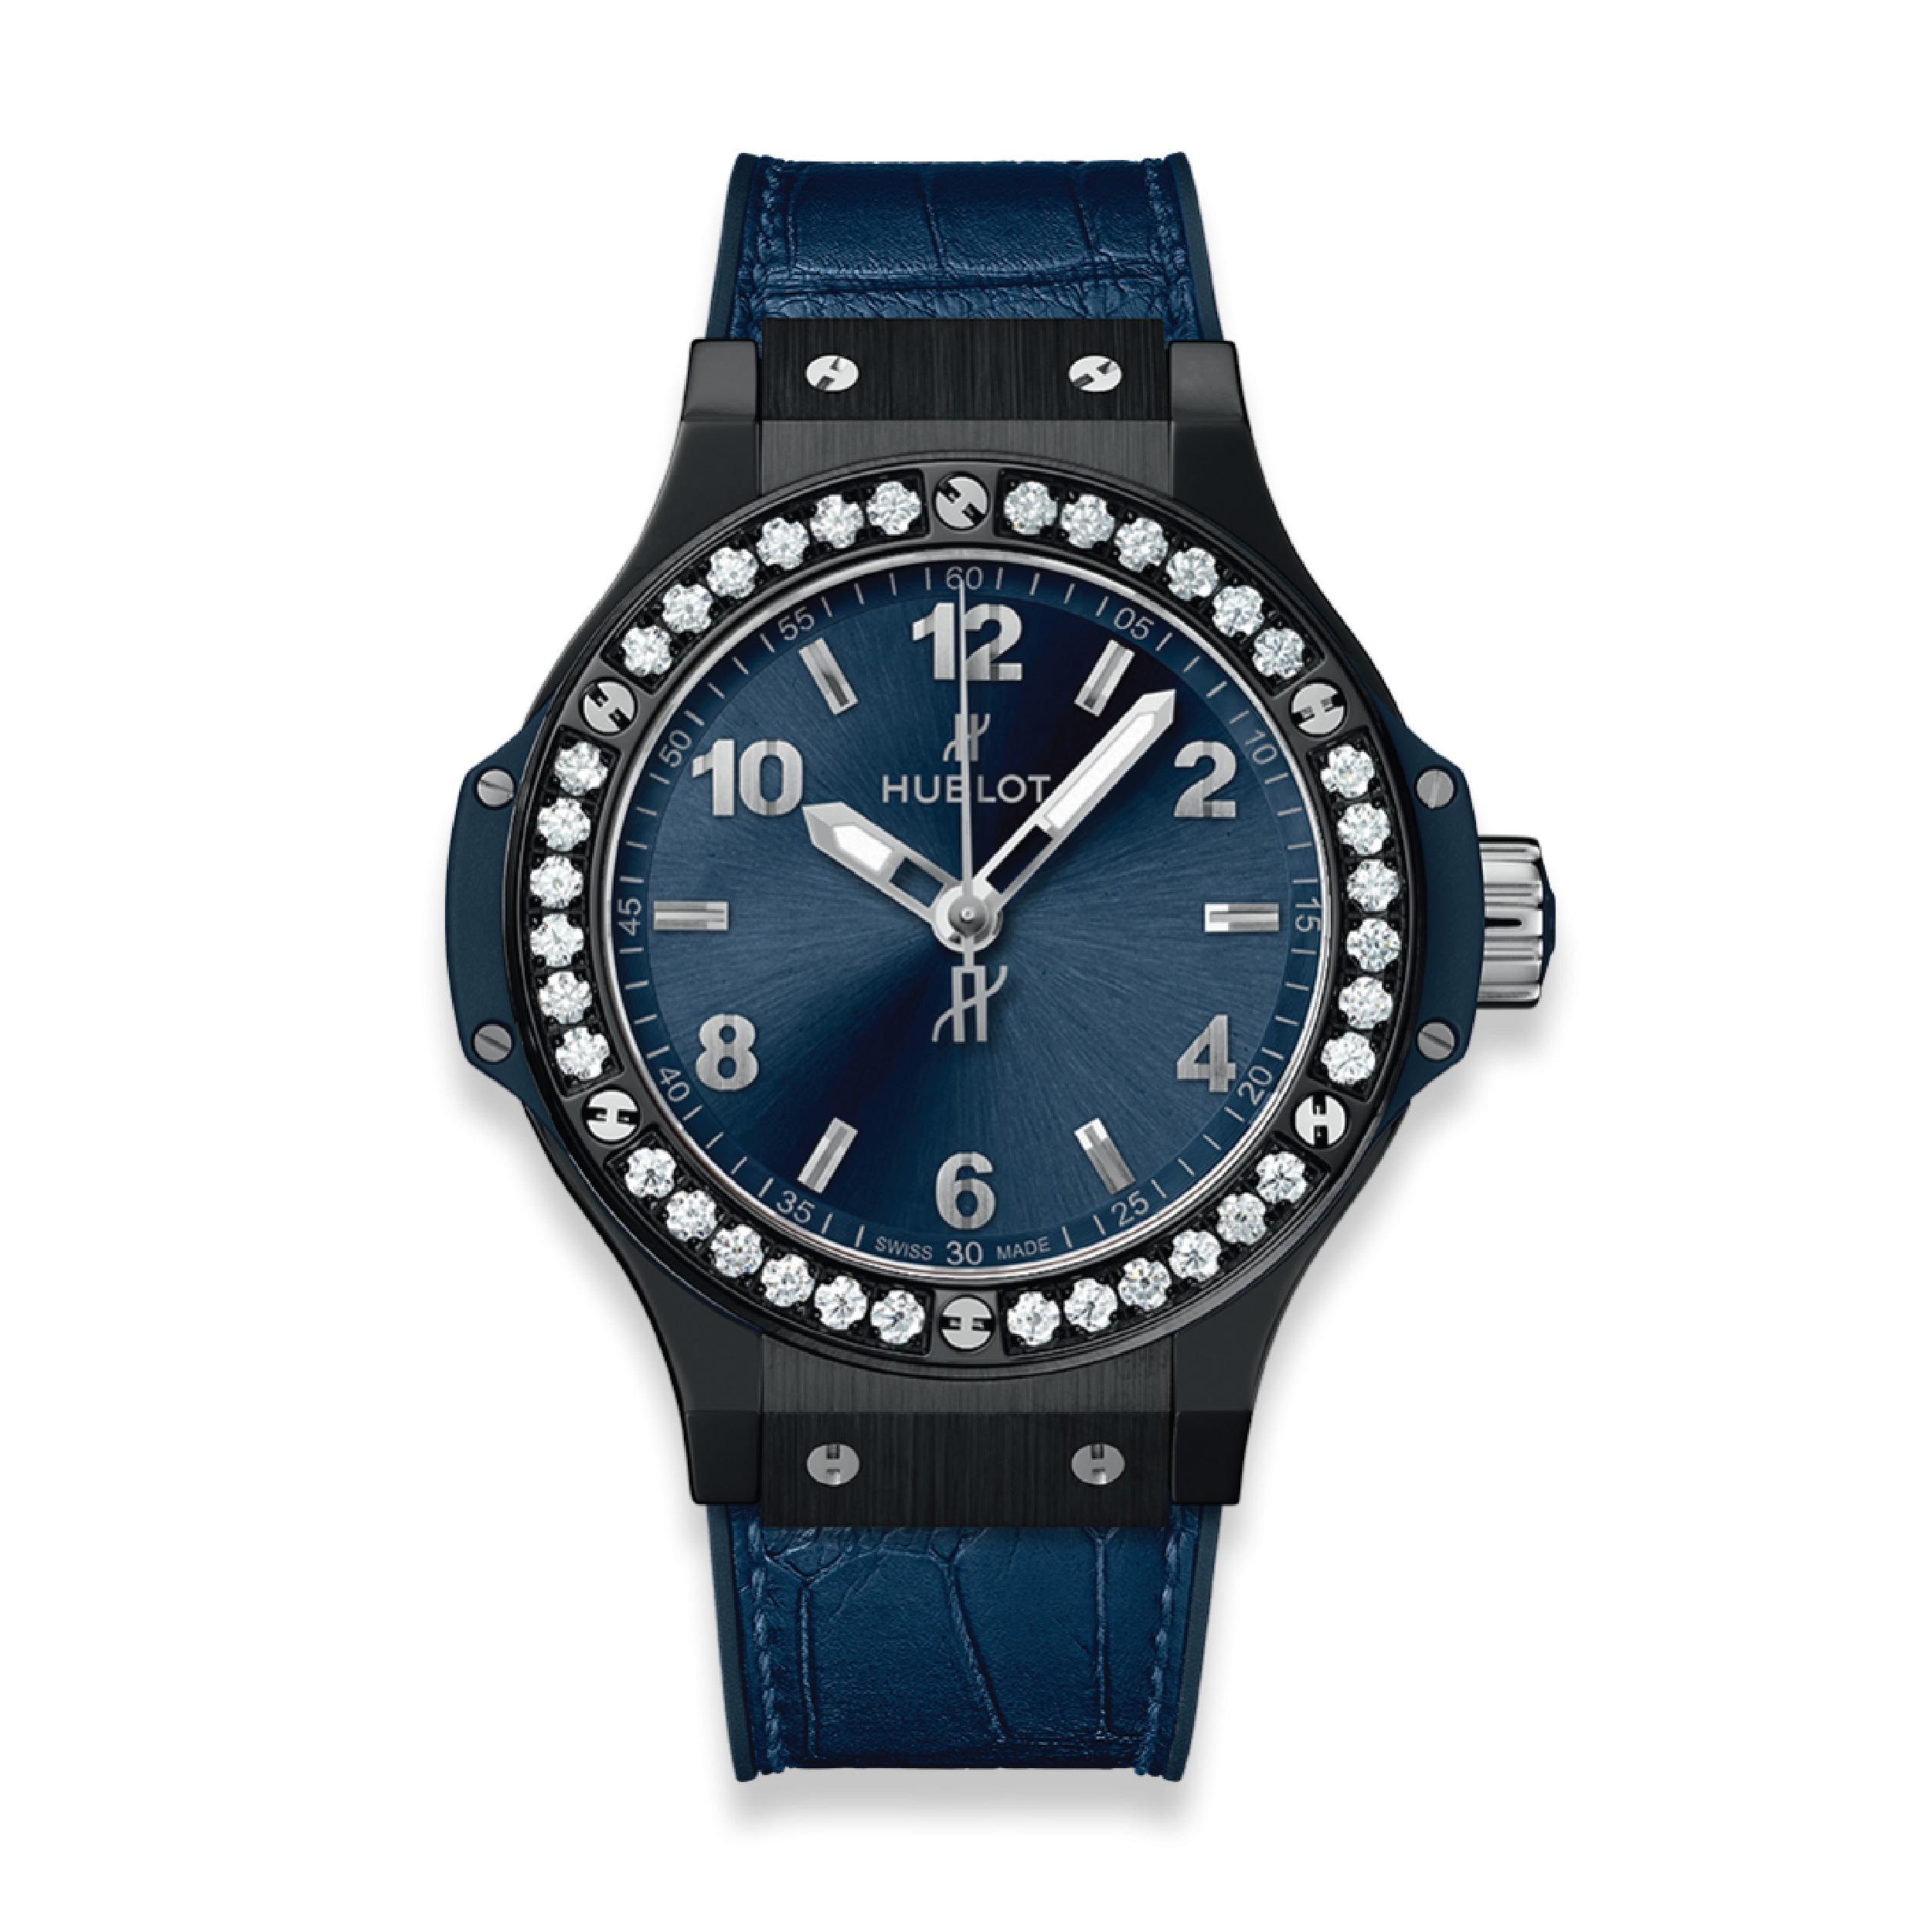 HUBLOT ЧАСЫ BIG BANG CERAMIC BLUE DIAMONDS 38 mm